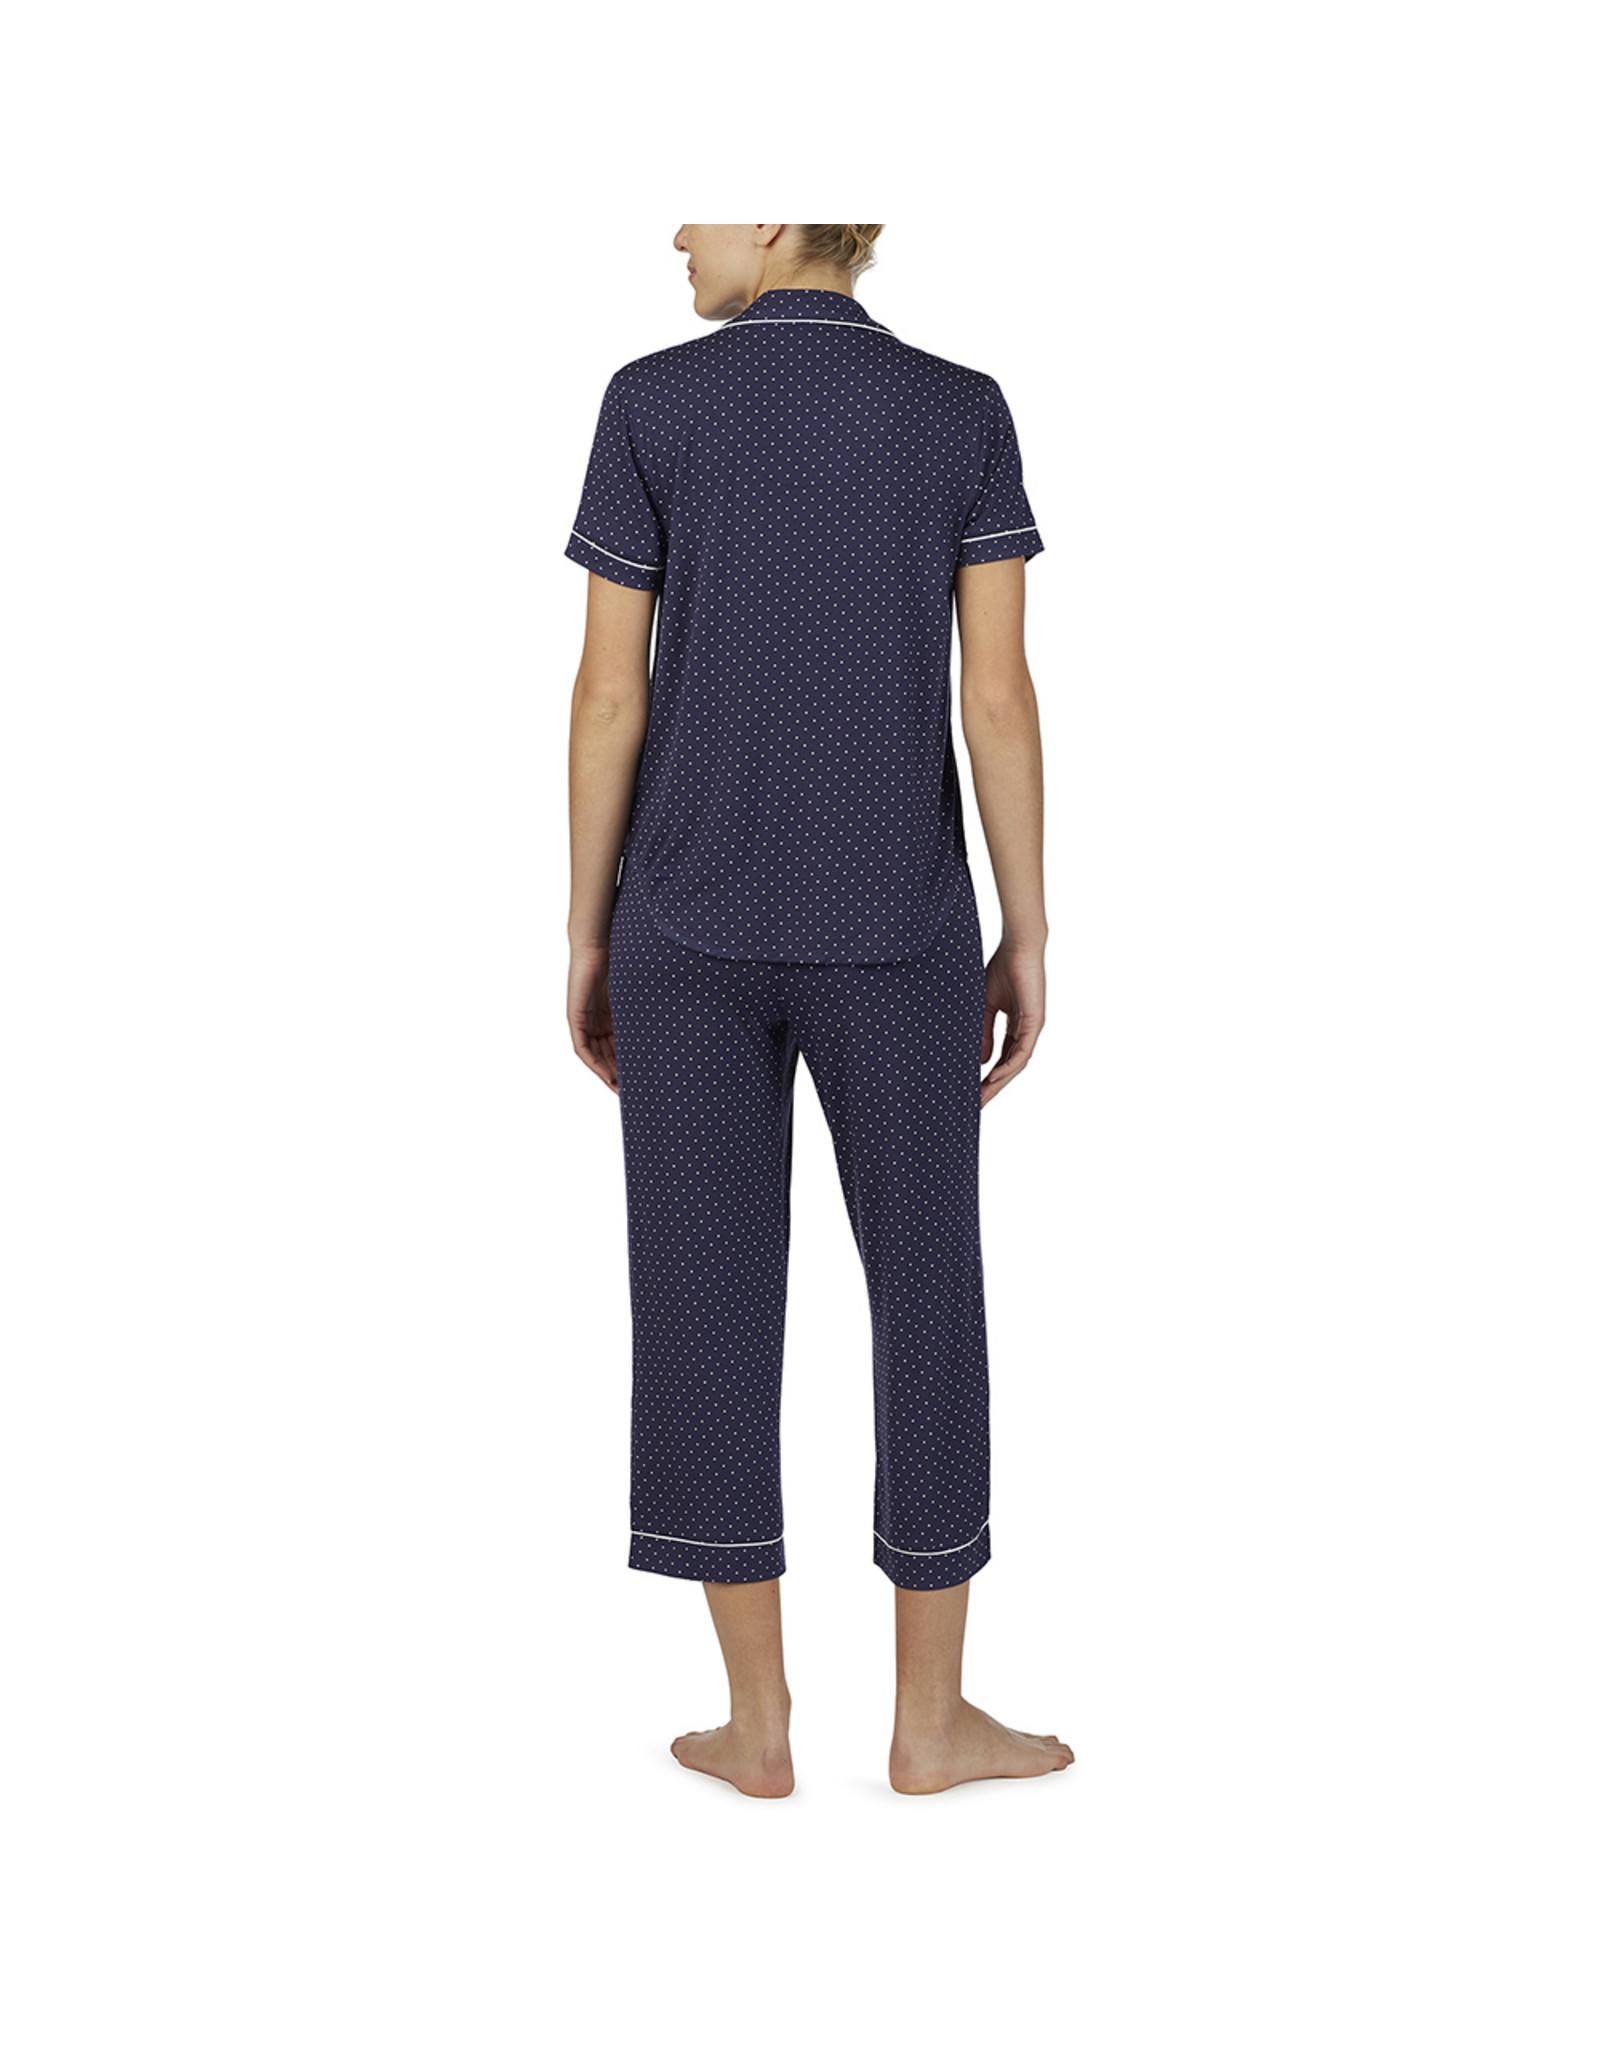 Kate Spade Pin Dot Short Sleeve Capri Pajama